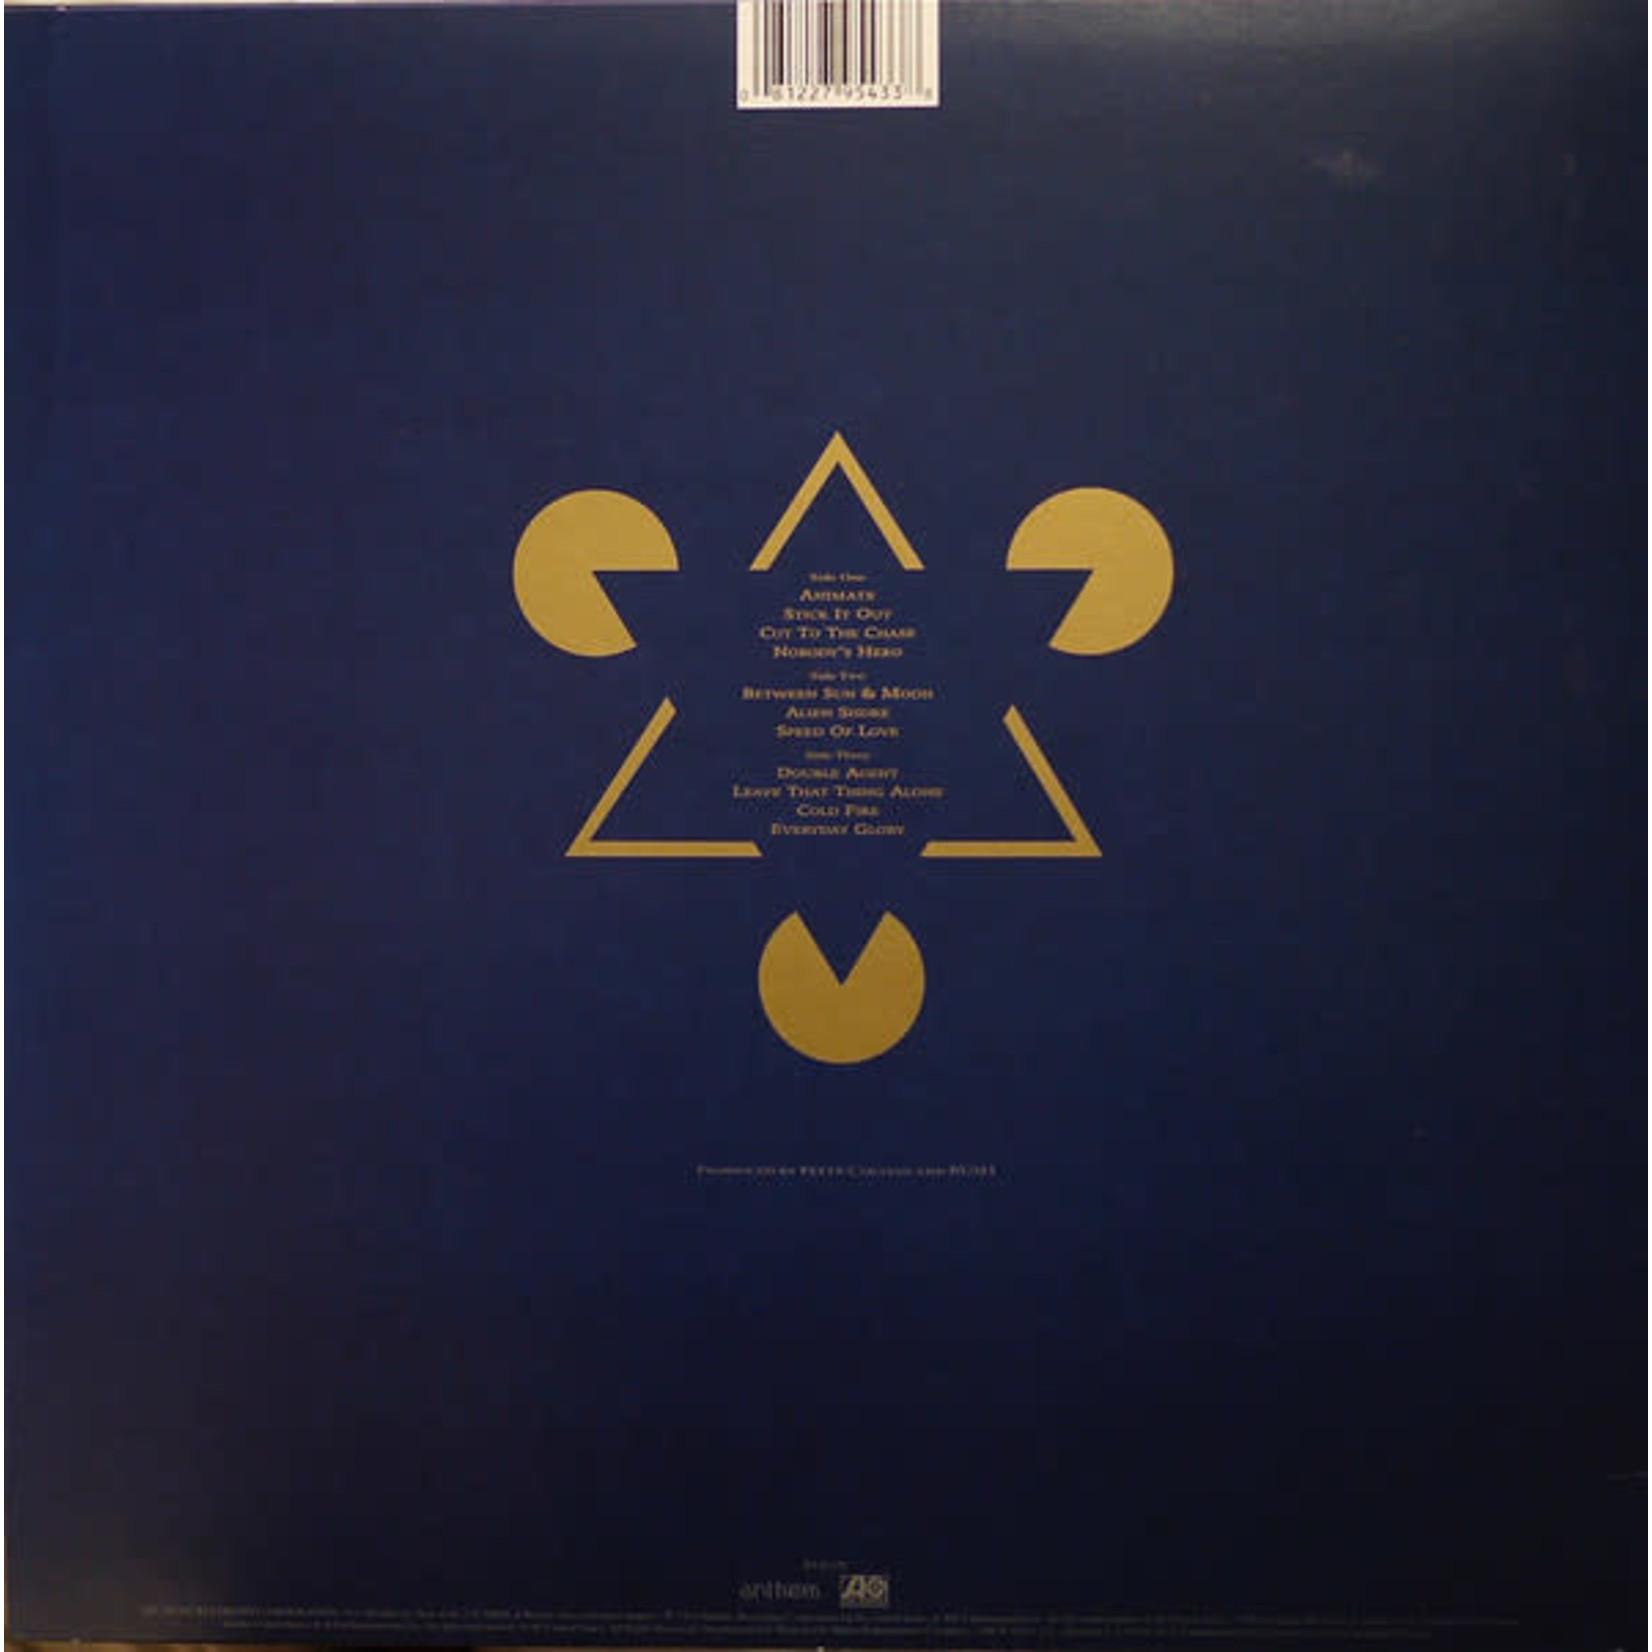 RUSH COUNTERPARTS  REMASTERED  200g LP